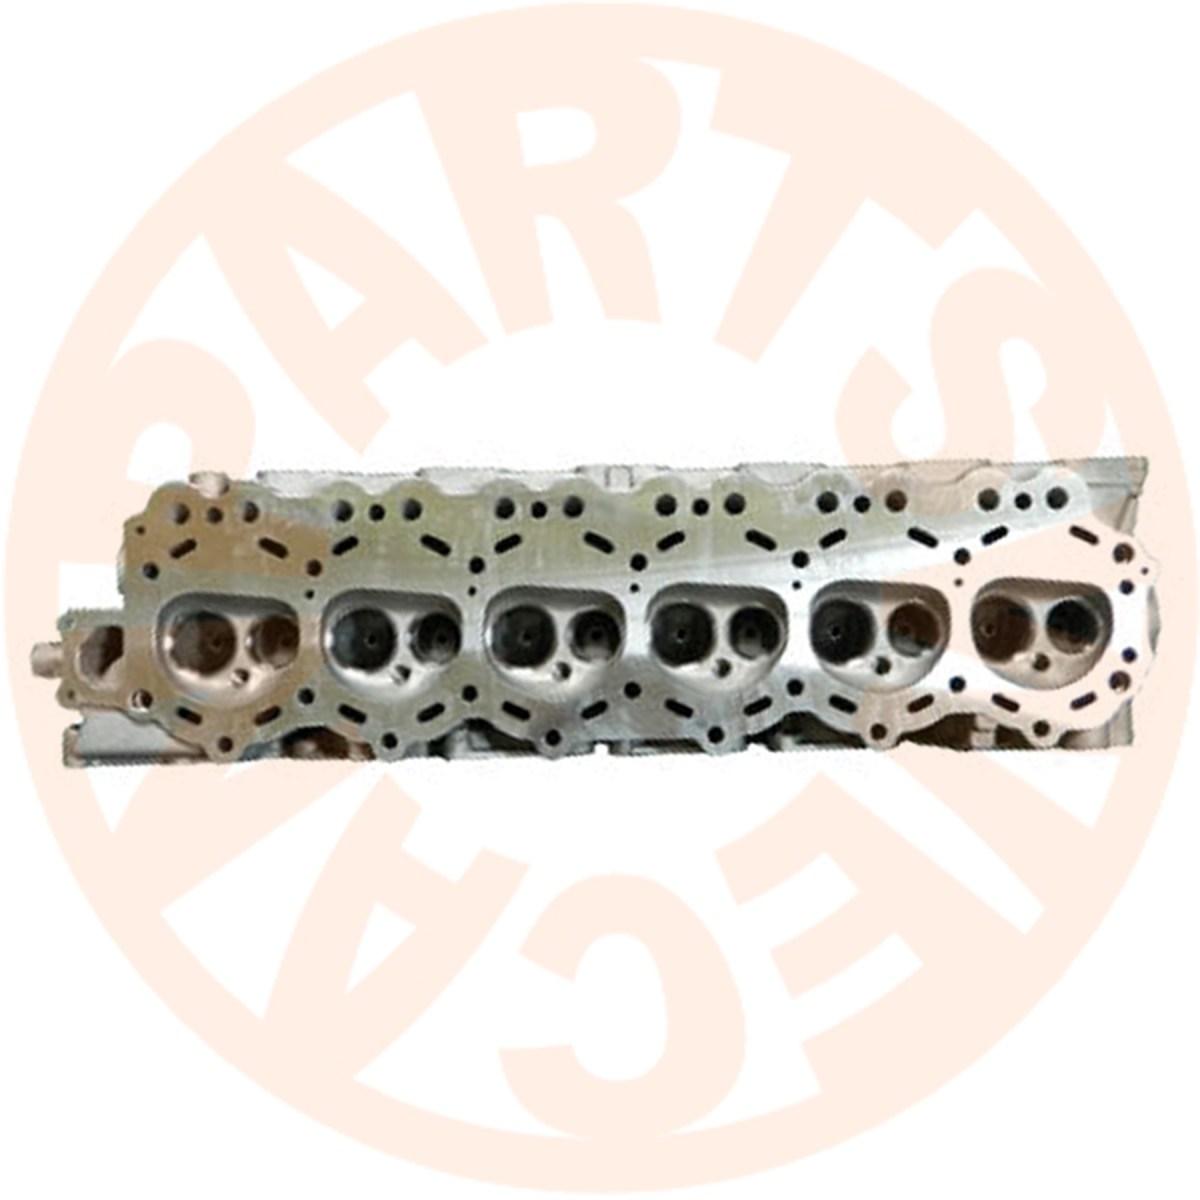 Cylinder Head Storage : Cylinder head nissan tb engine forklift aftermarket